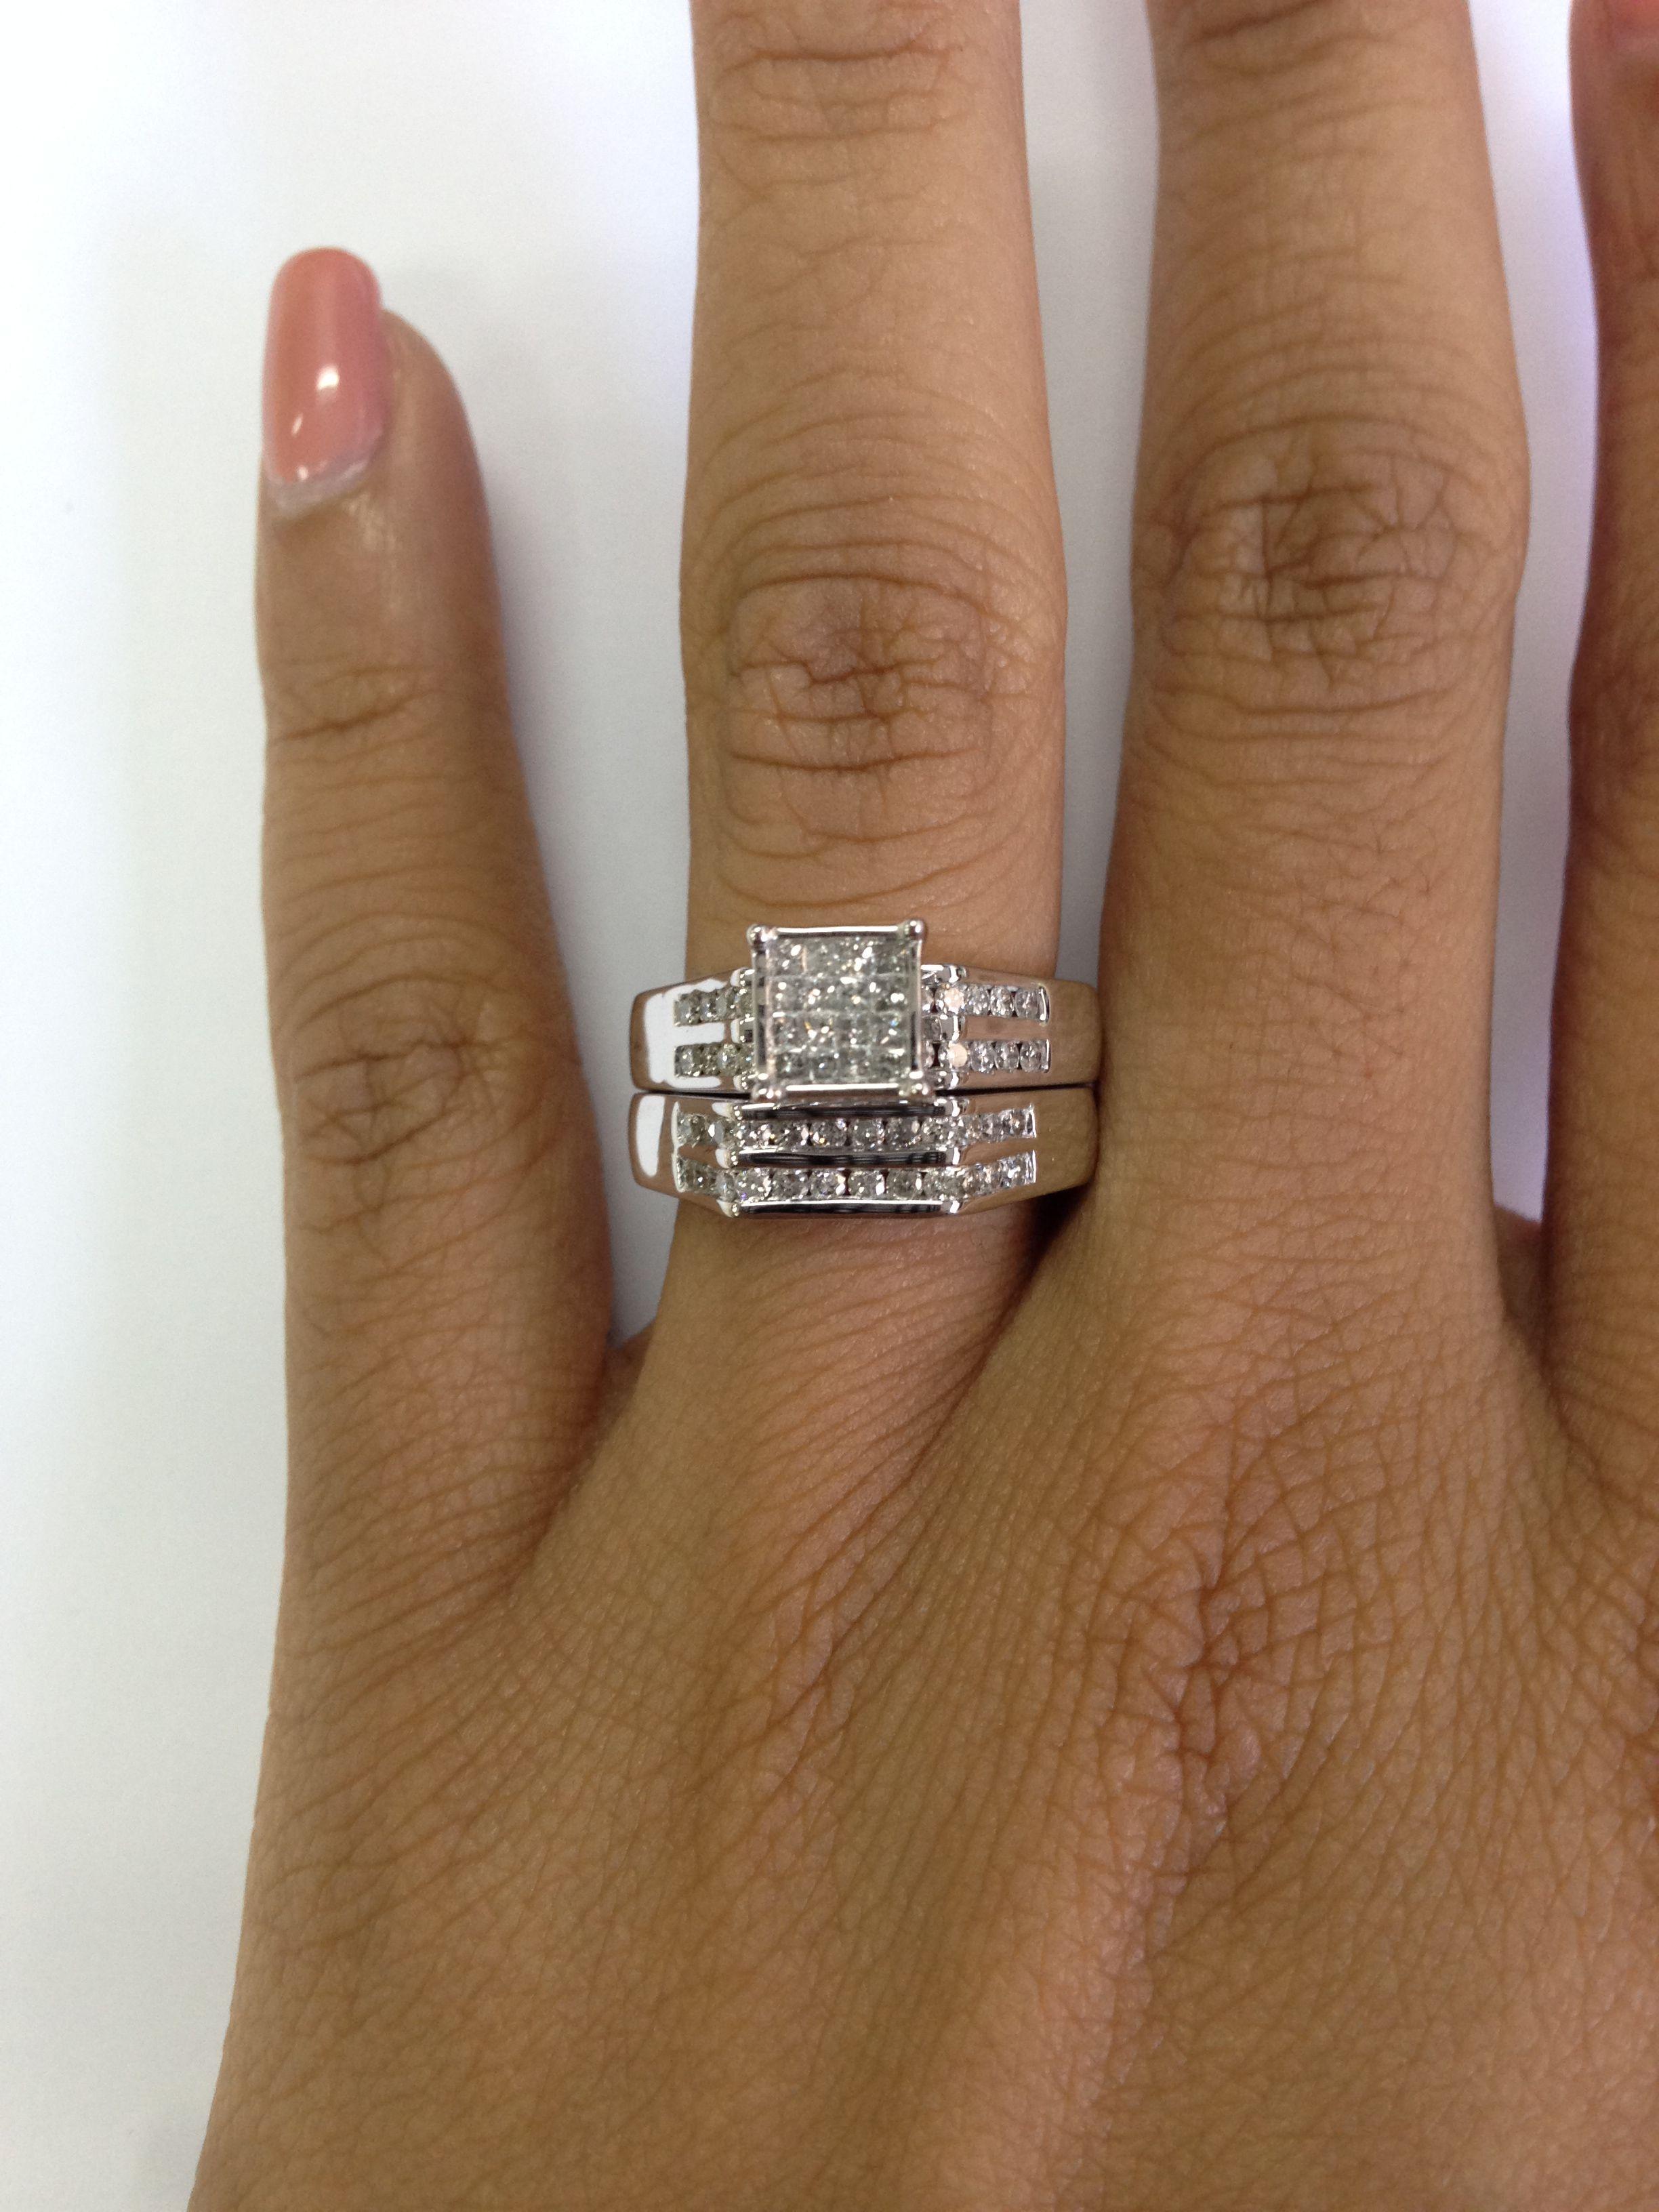 1 Carat Diamond Trio Wedding Ring Set 14k Yellow Gold Gold Rings Jewelry Gold Ruby Stud Earrings Wedding Rings